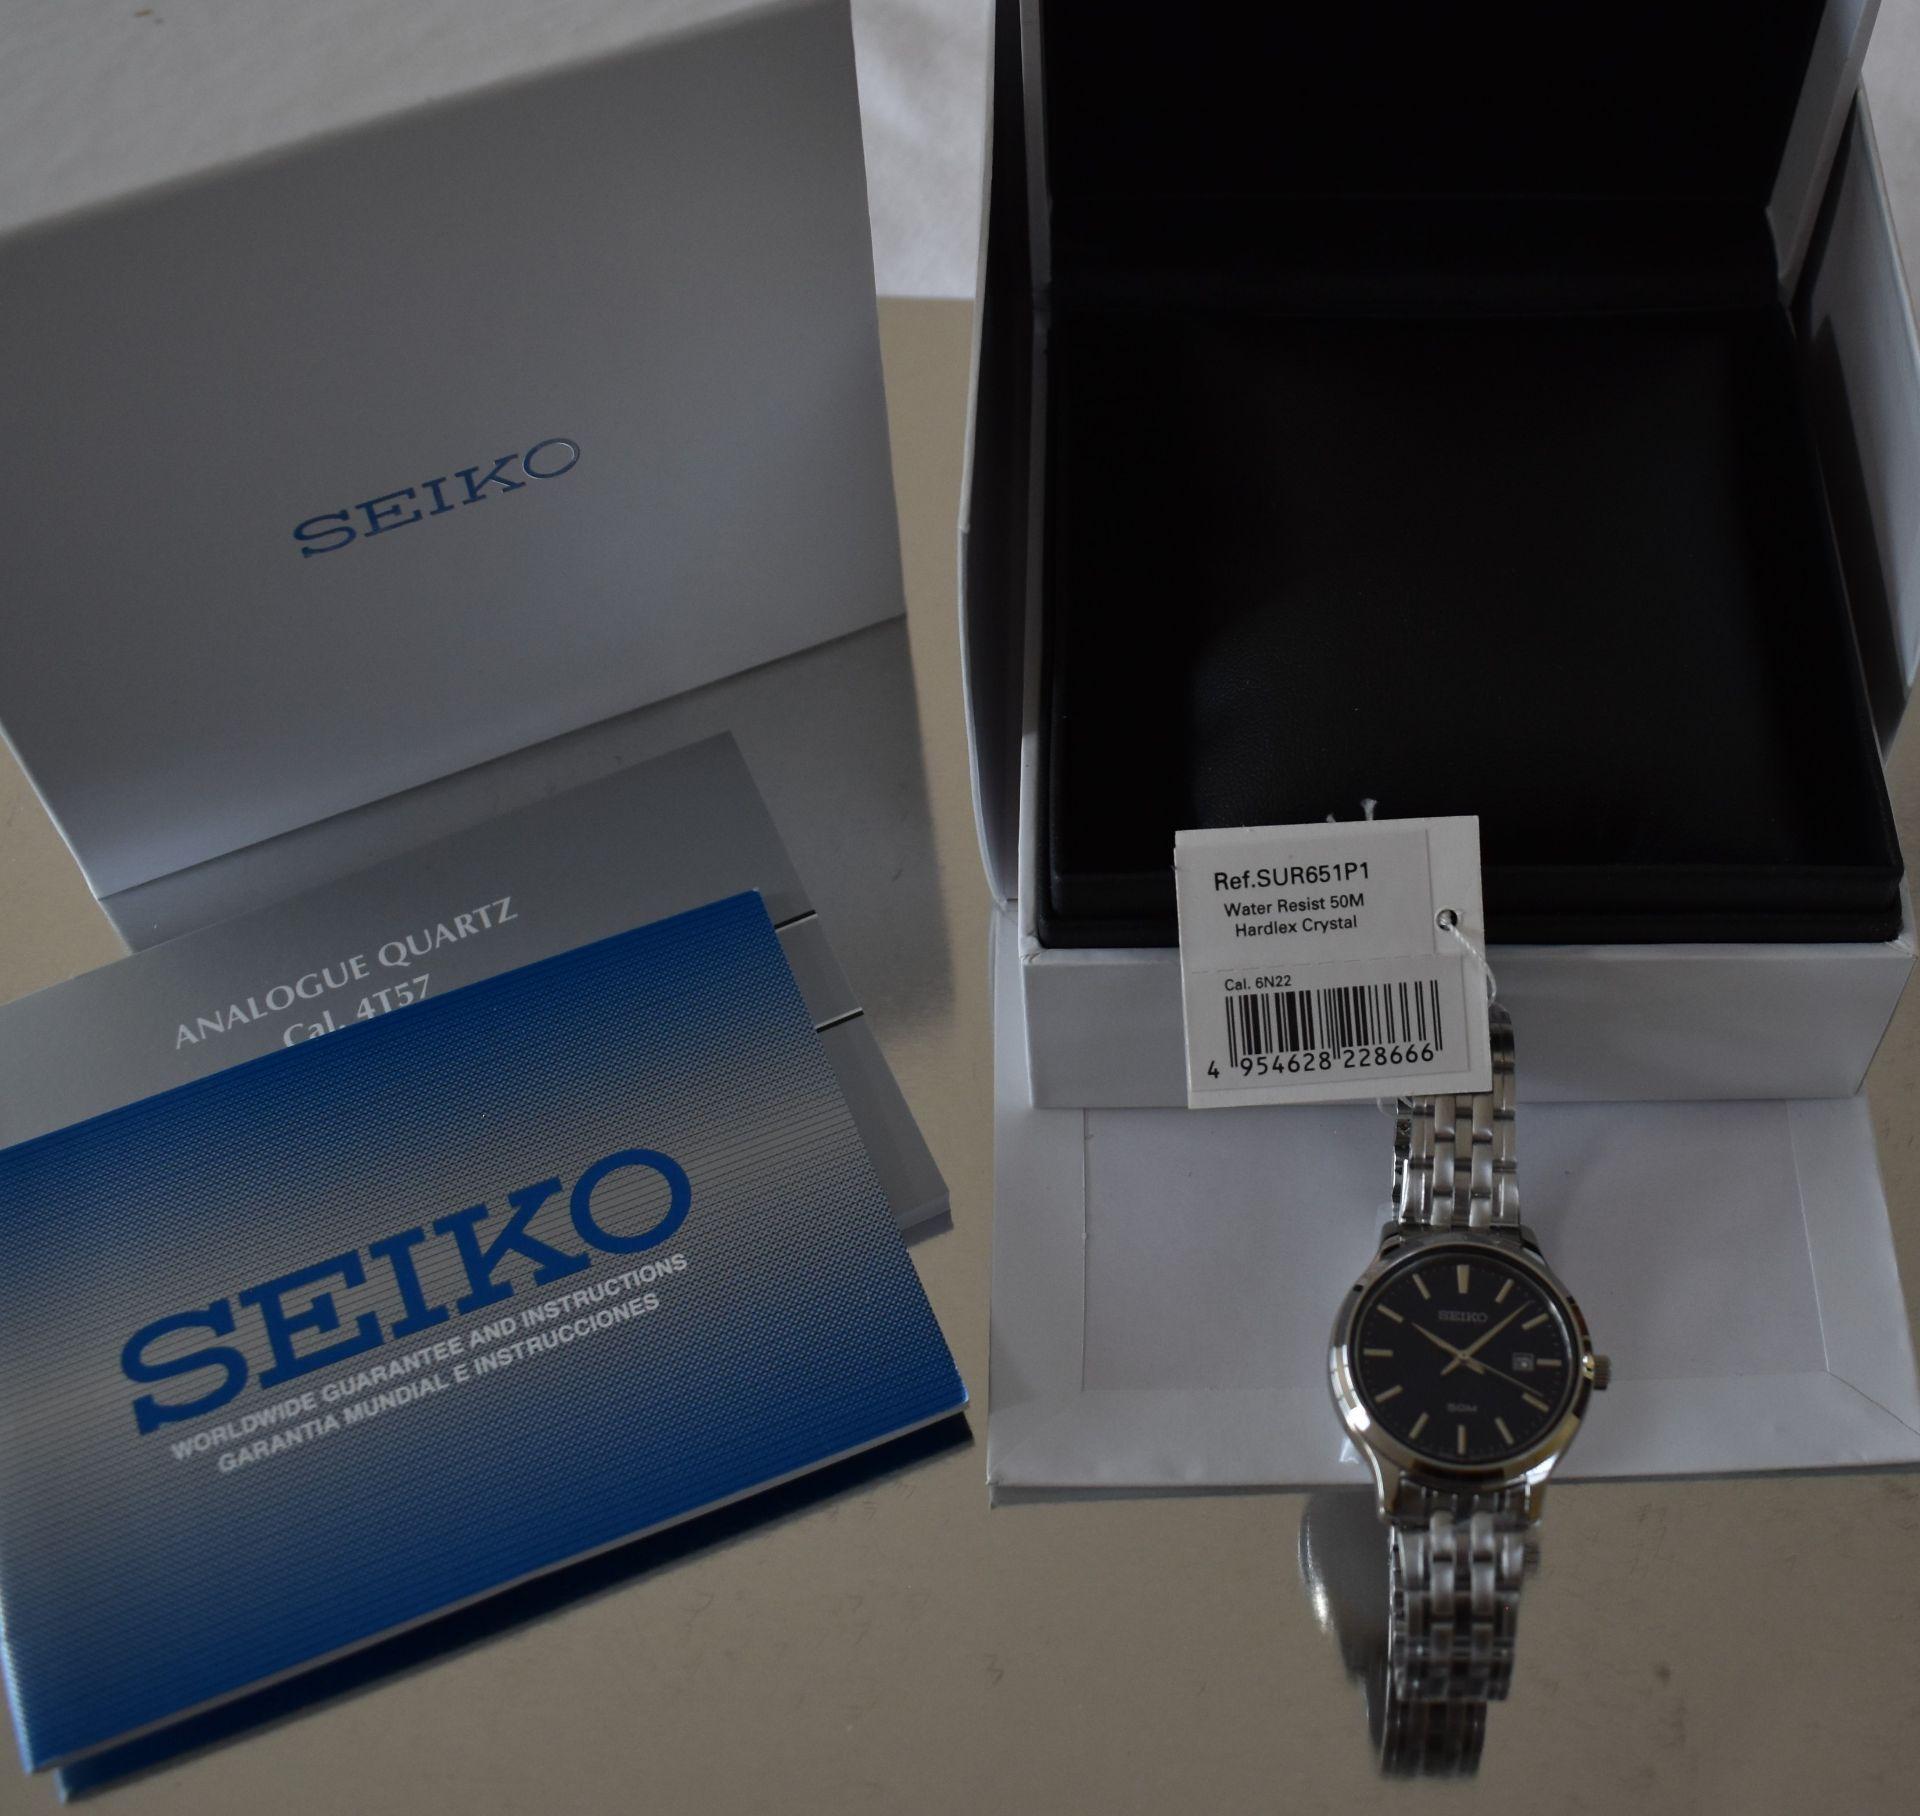 Seiko Ladies Watch SUR651P1 - Image 3 of 3